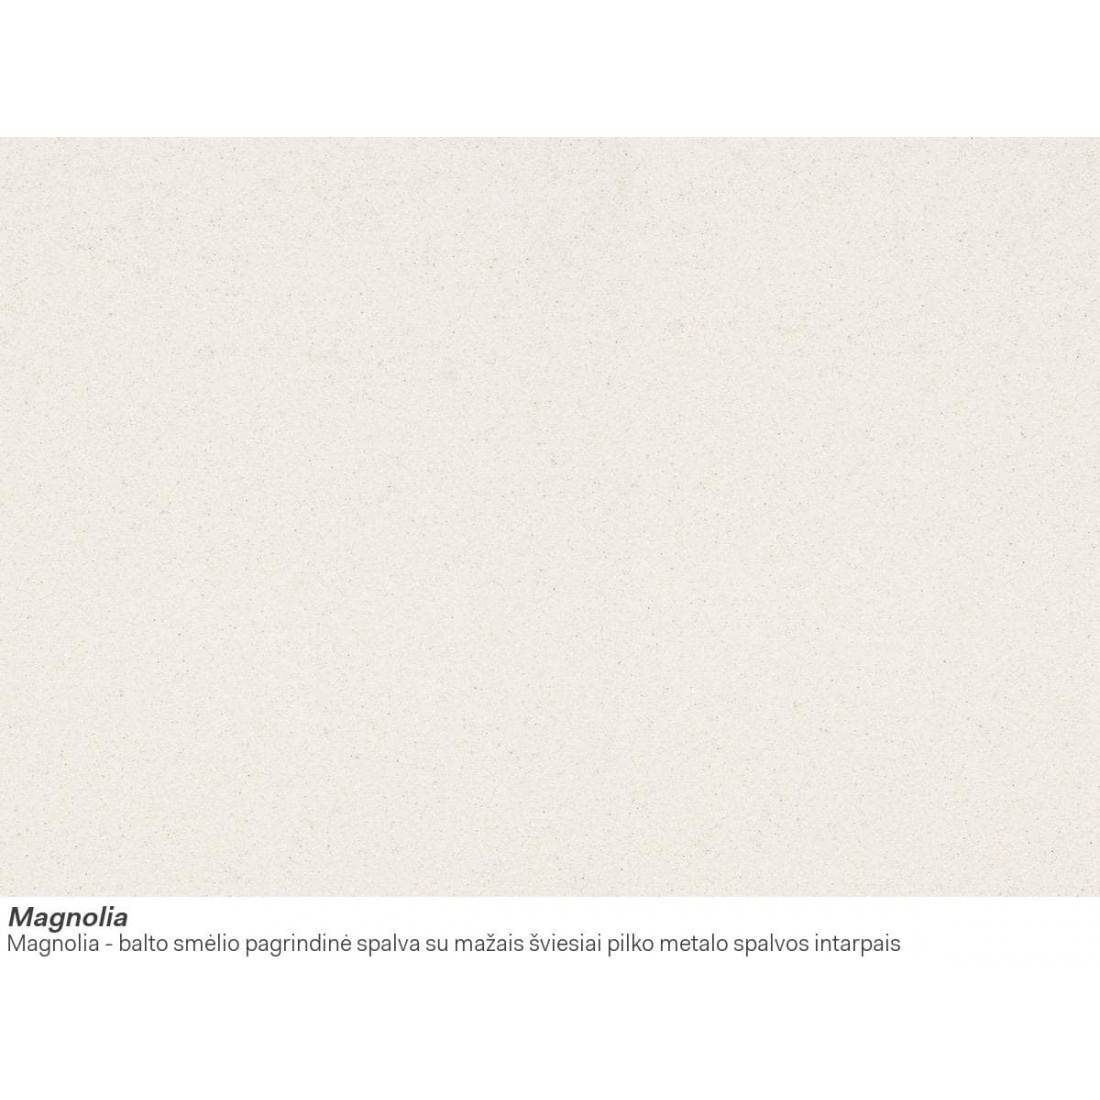 Akmens masės plautuvė Franke Maris, MRG 612-E, Magnolia